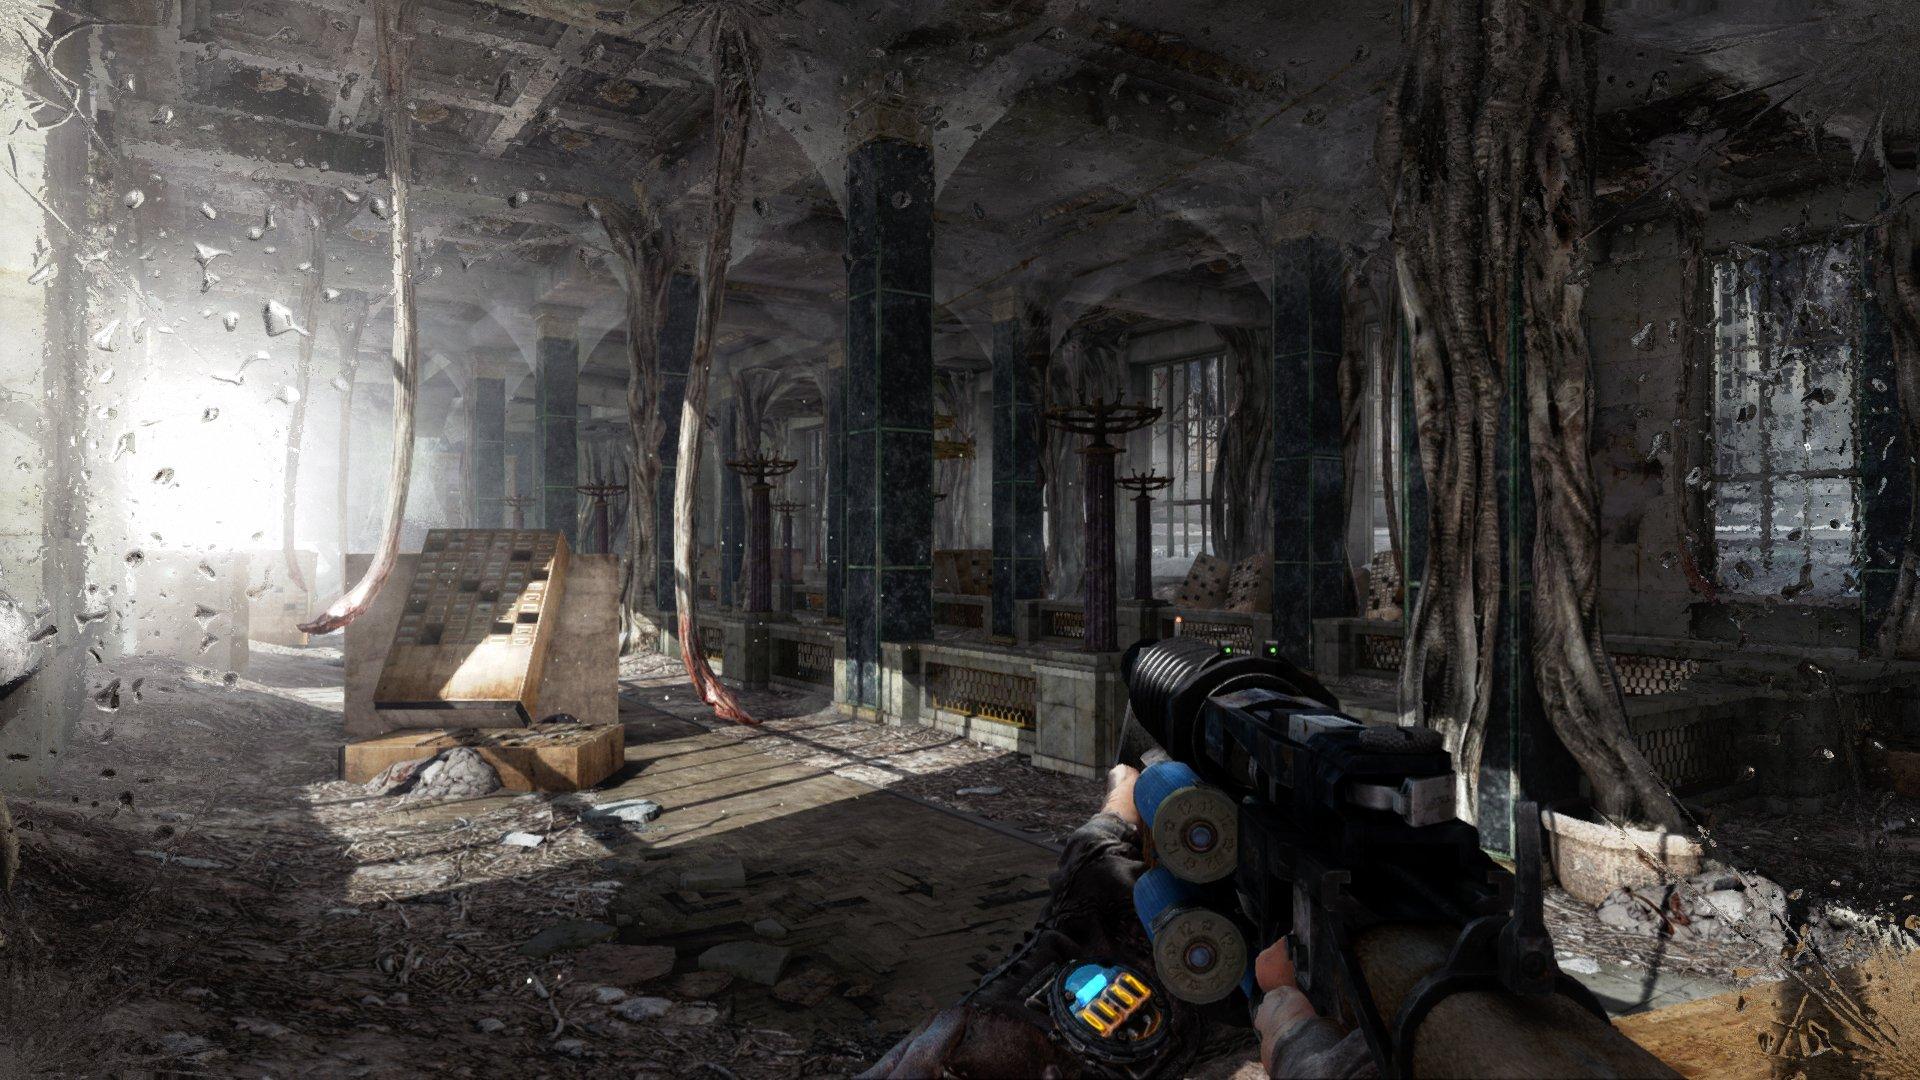 Nintendo Download: Metro 2033 and Last Light Redux screenshot